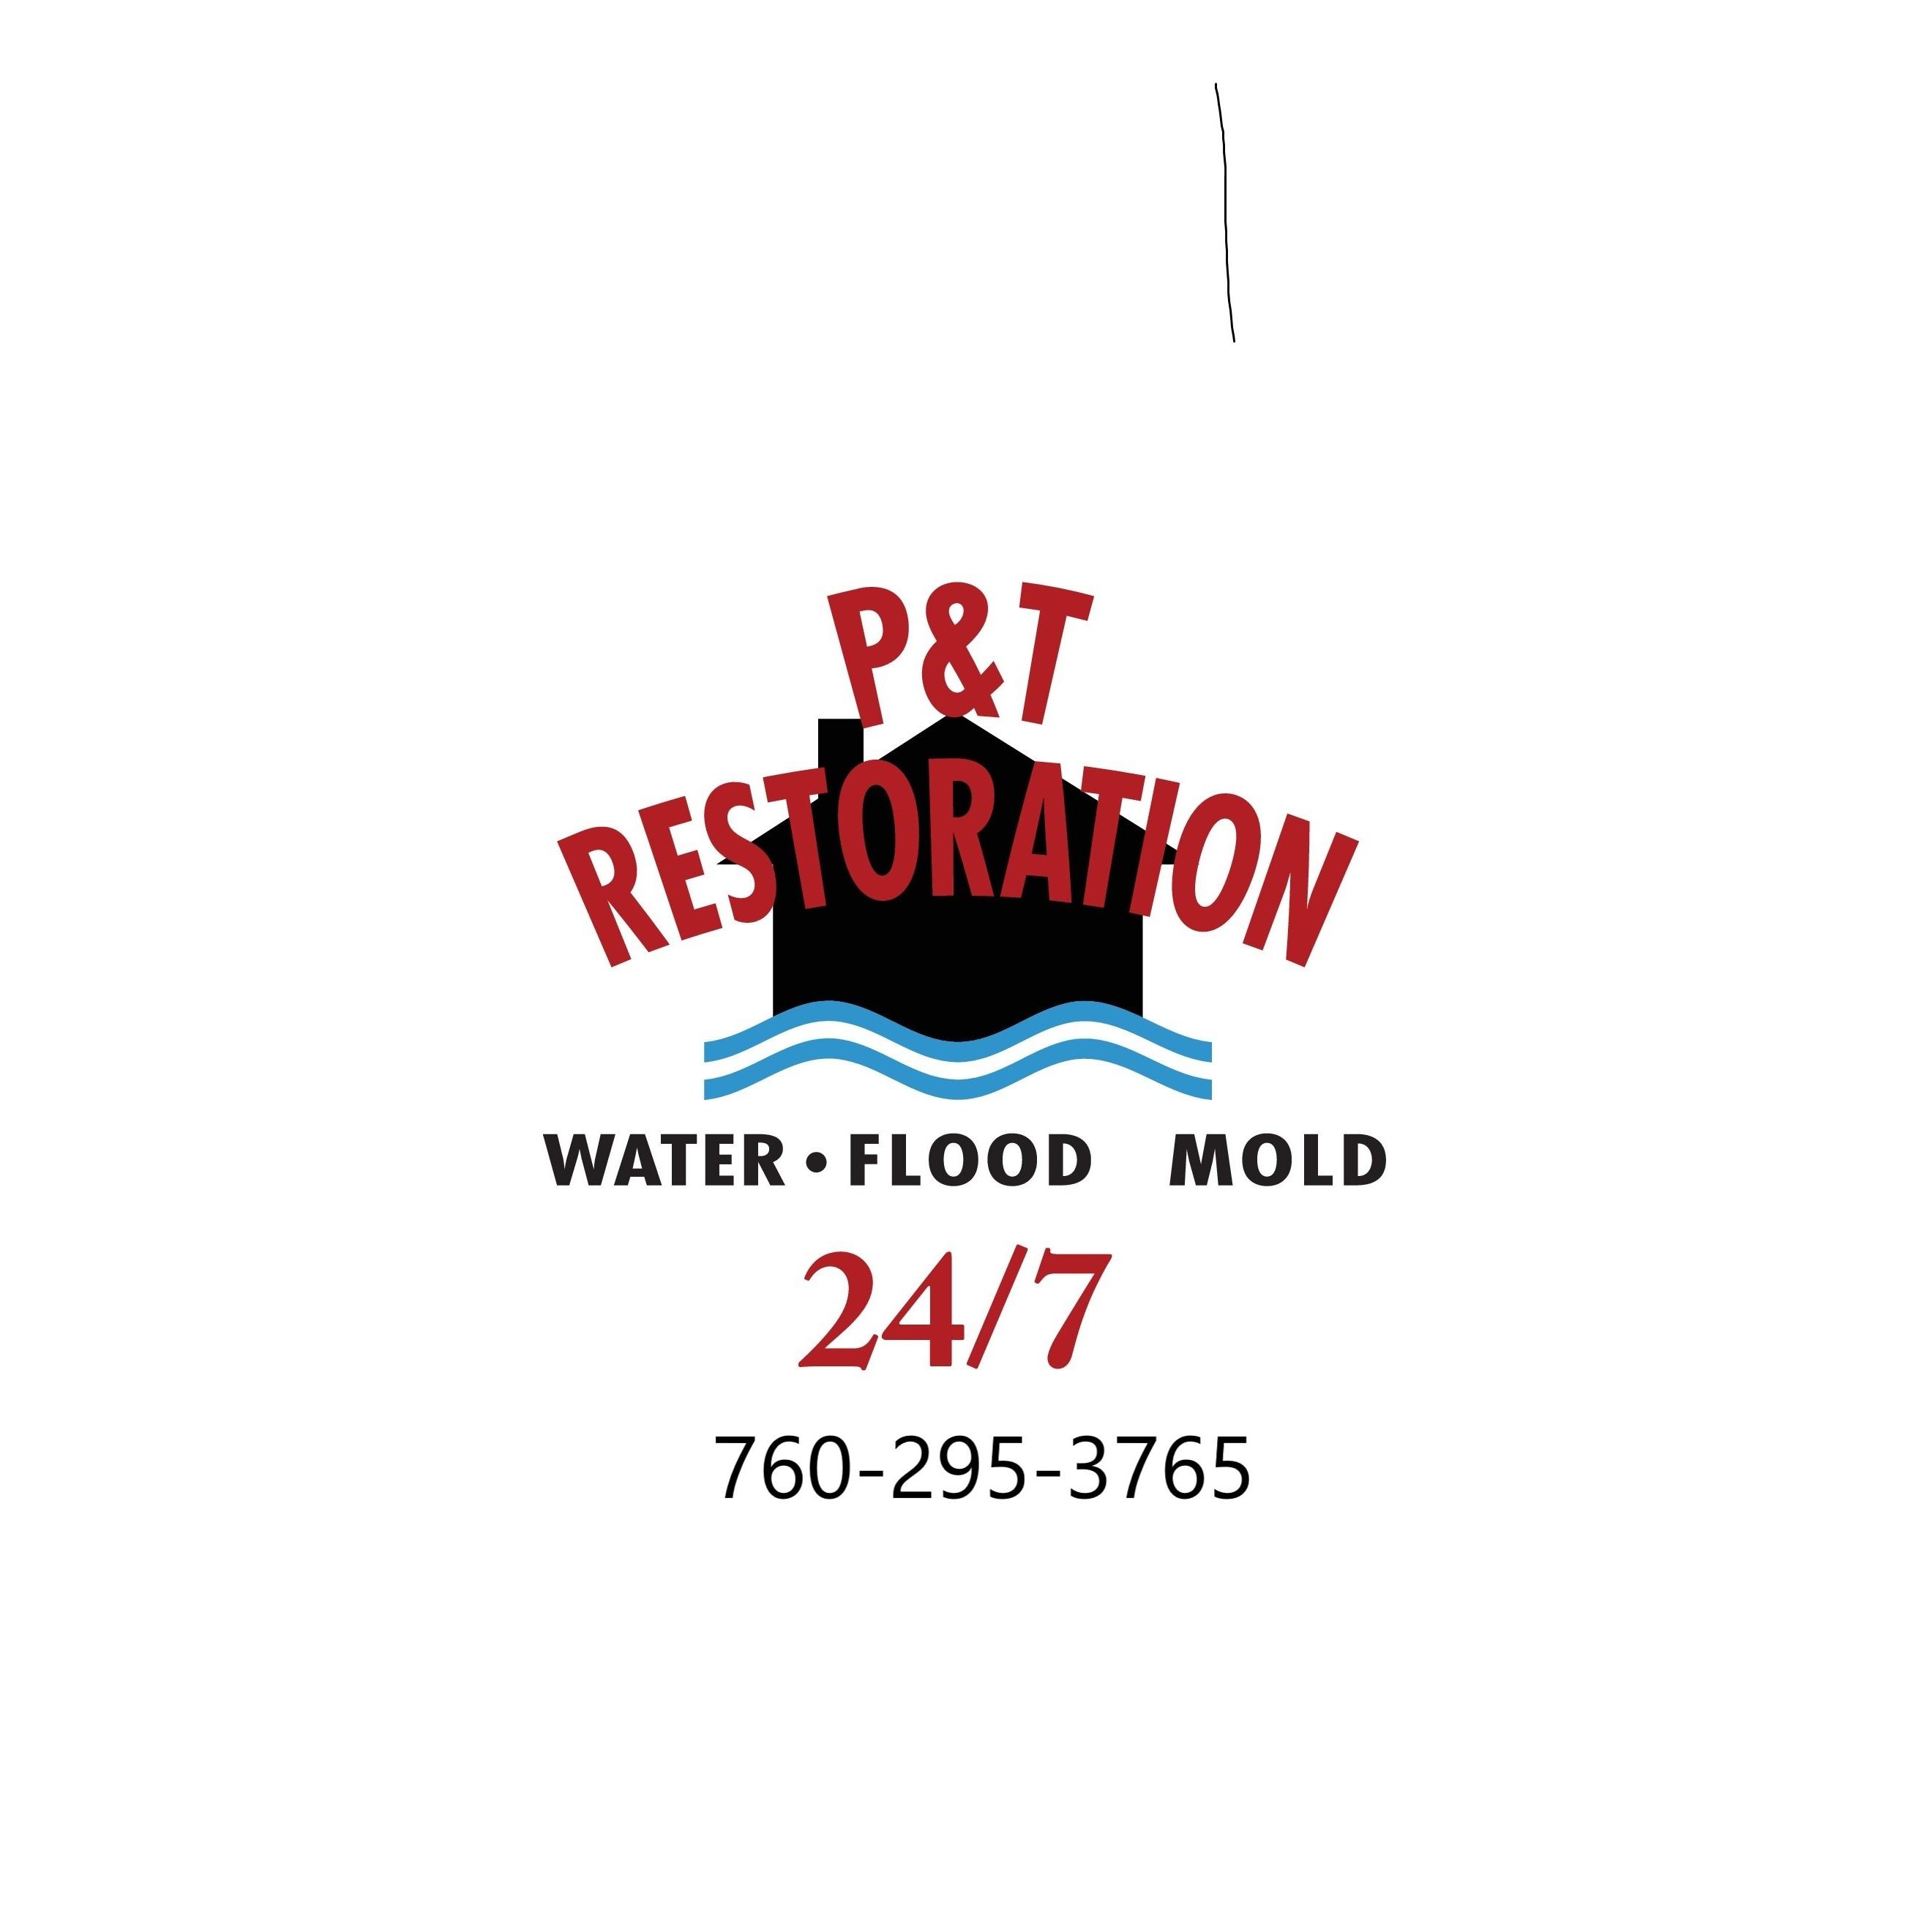 P & T Restoration